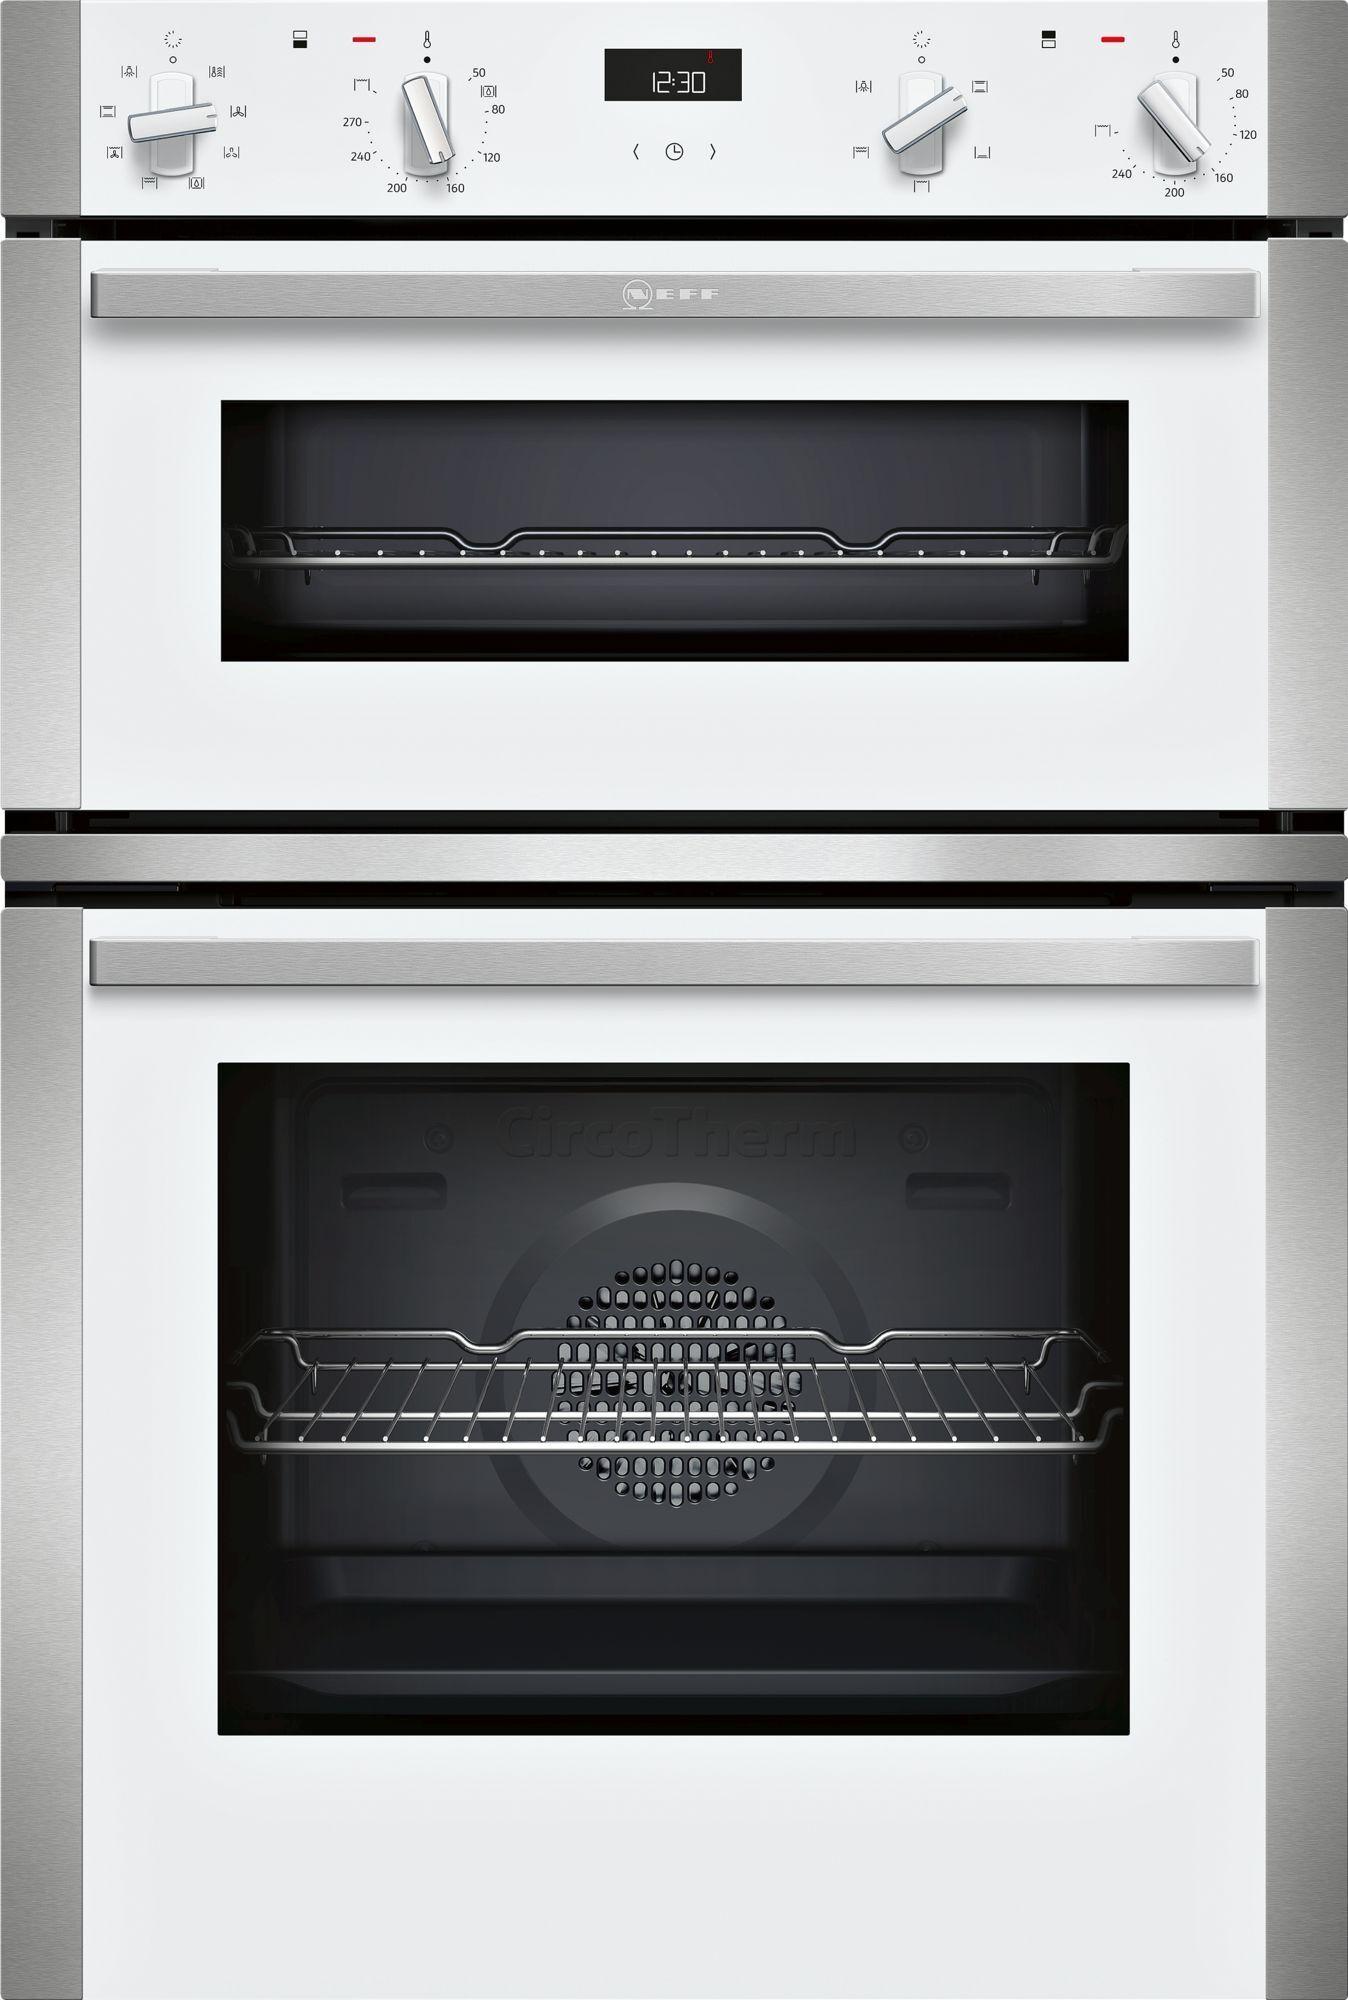 neff u1ace2hw0b n50 circotherm built double oven